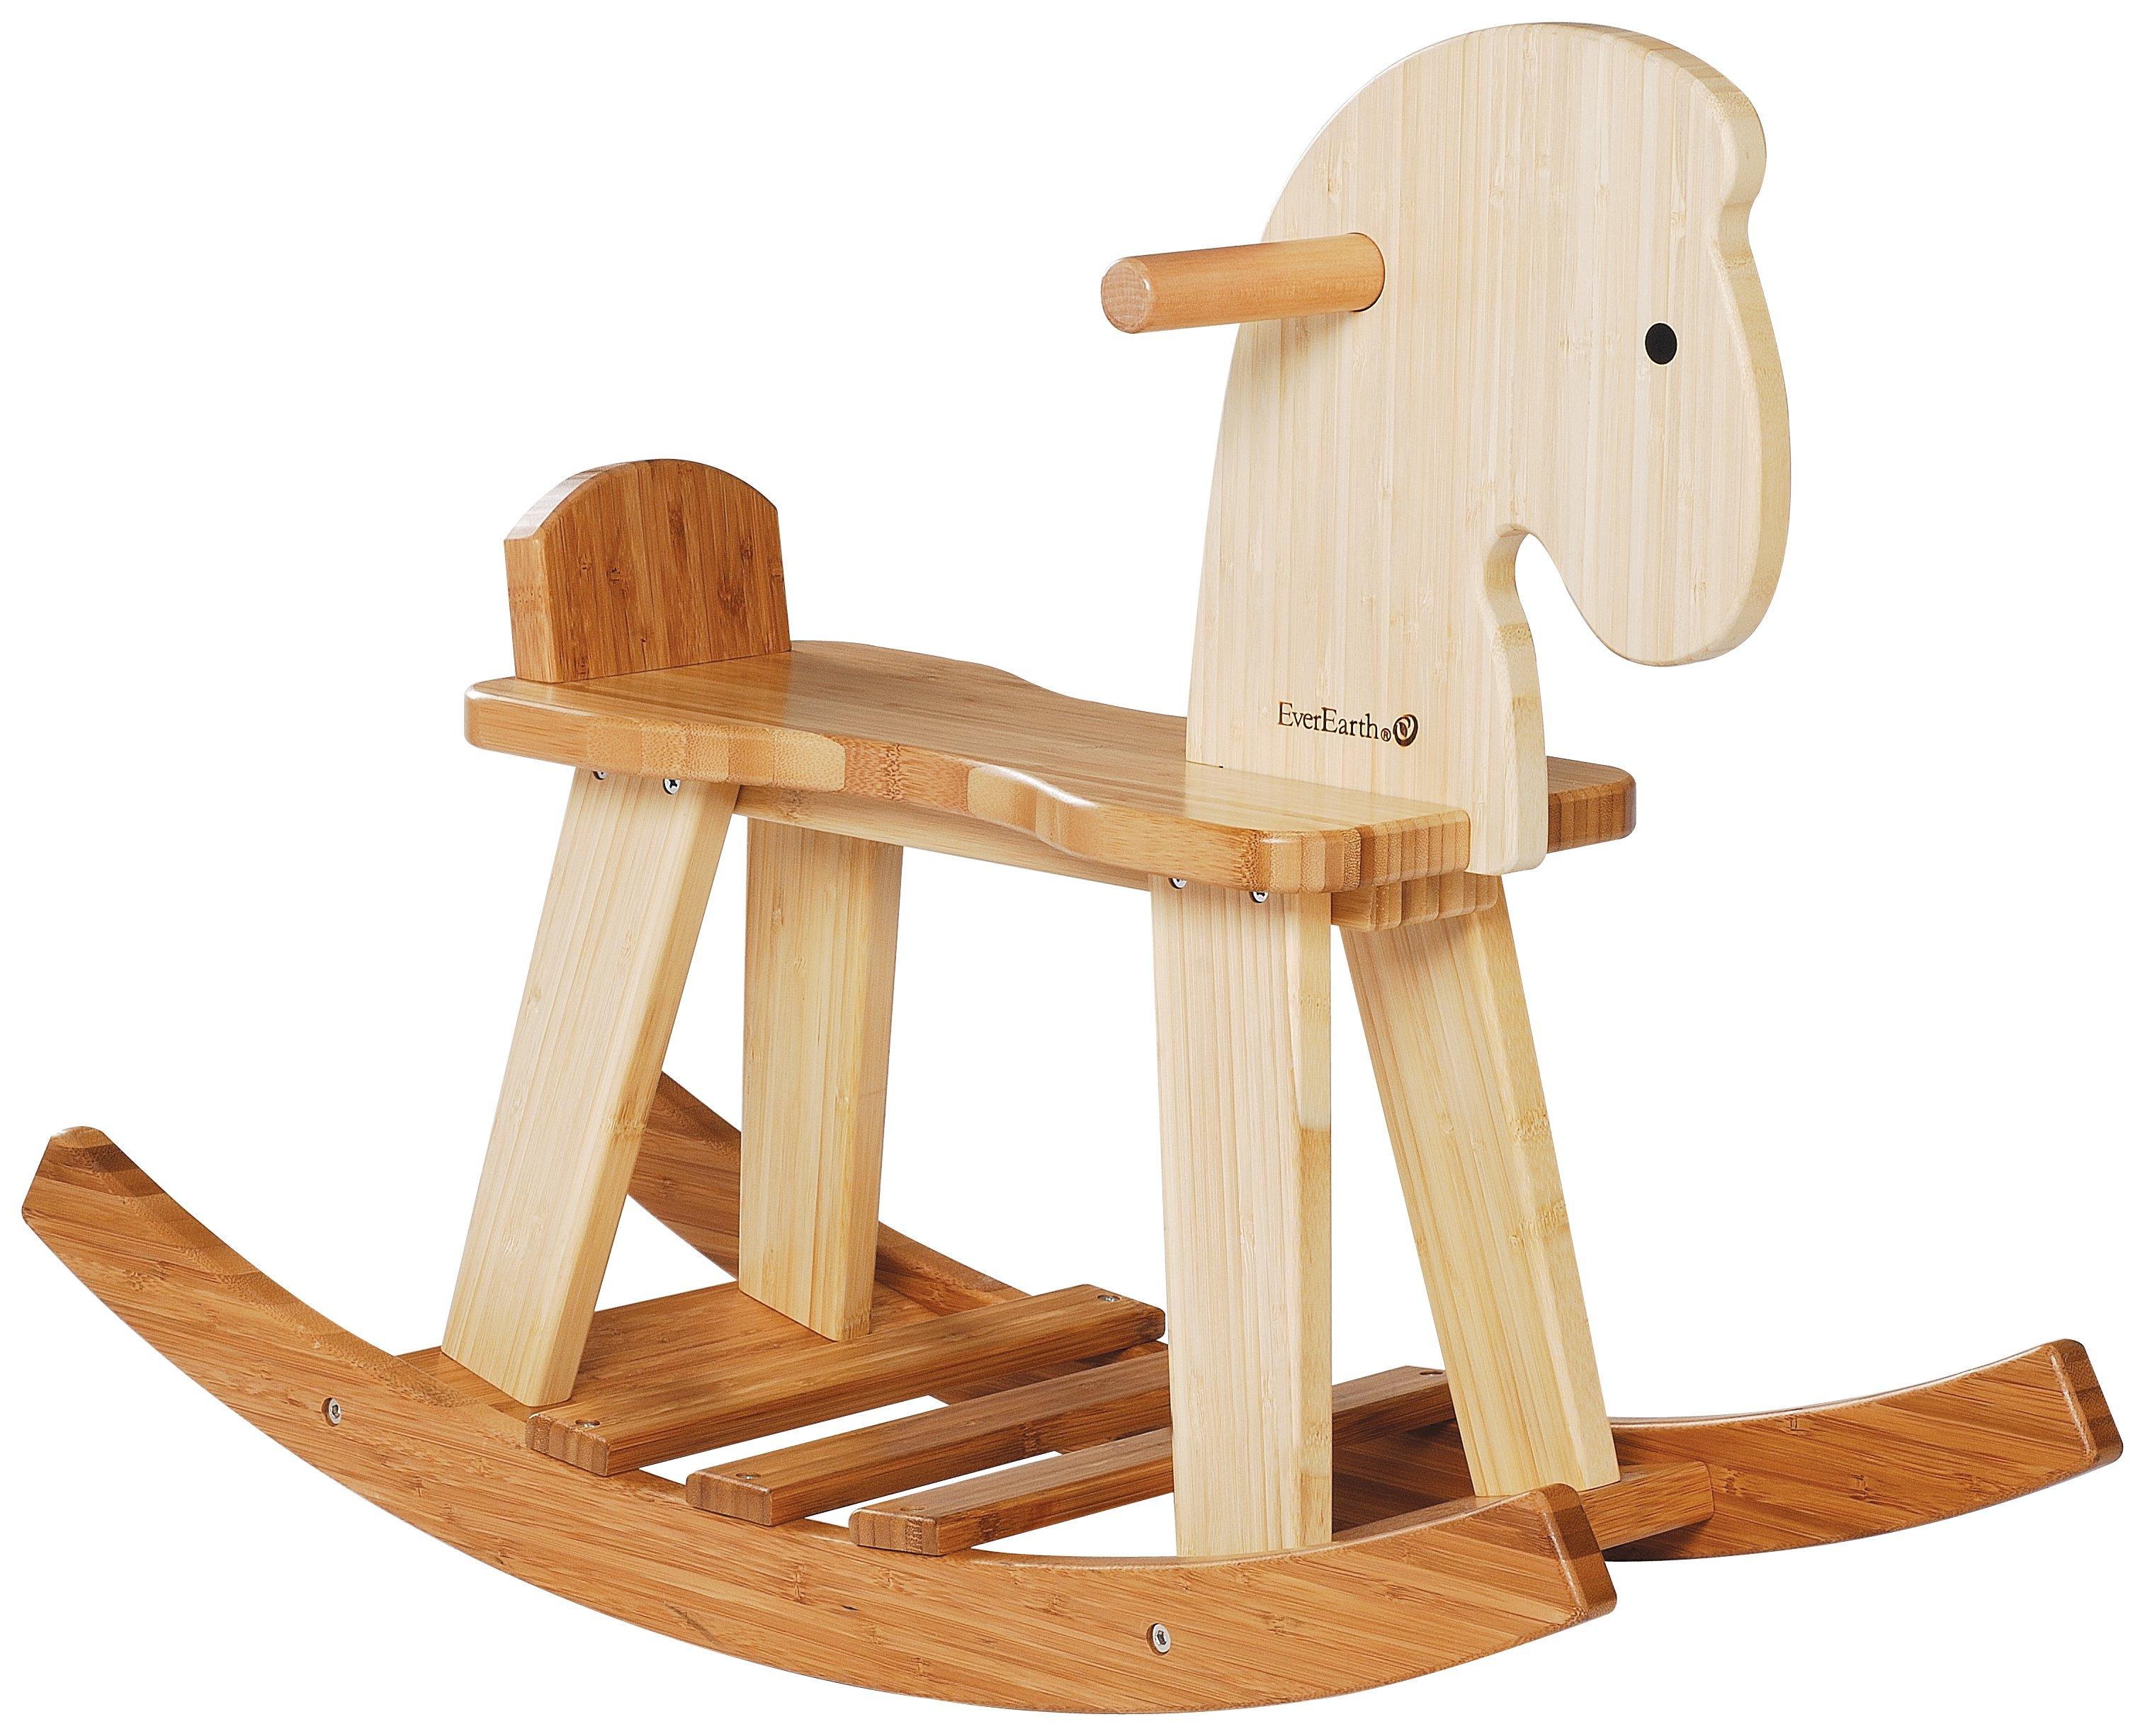 Image of EverEarth Bamboo Rocking Horse.